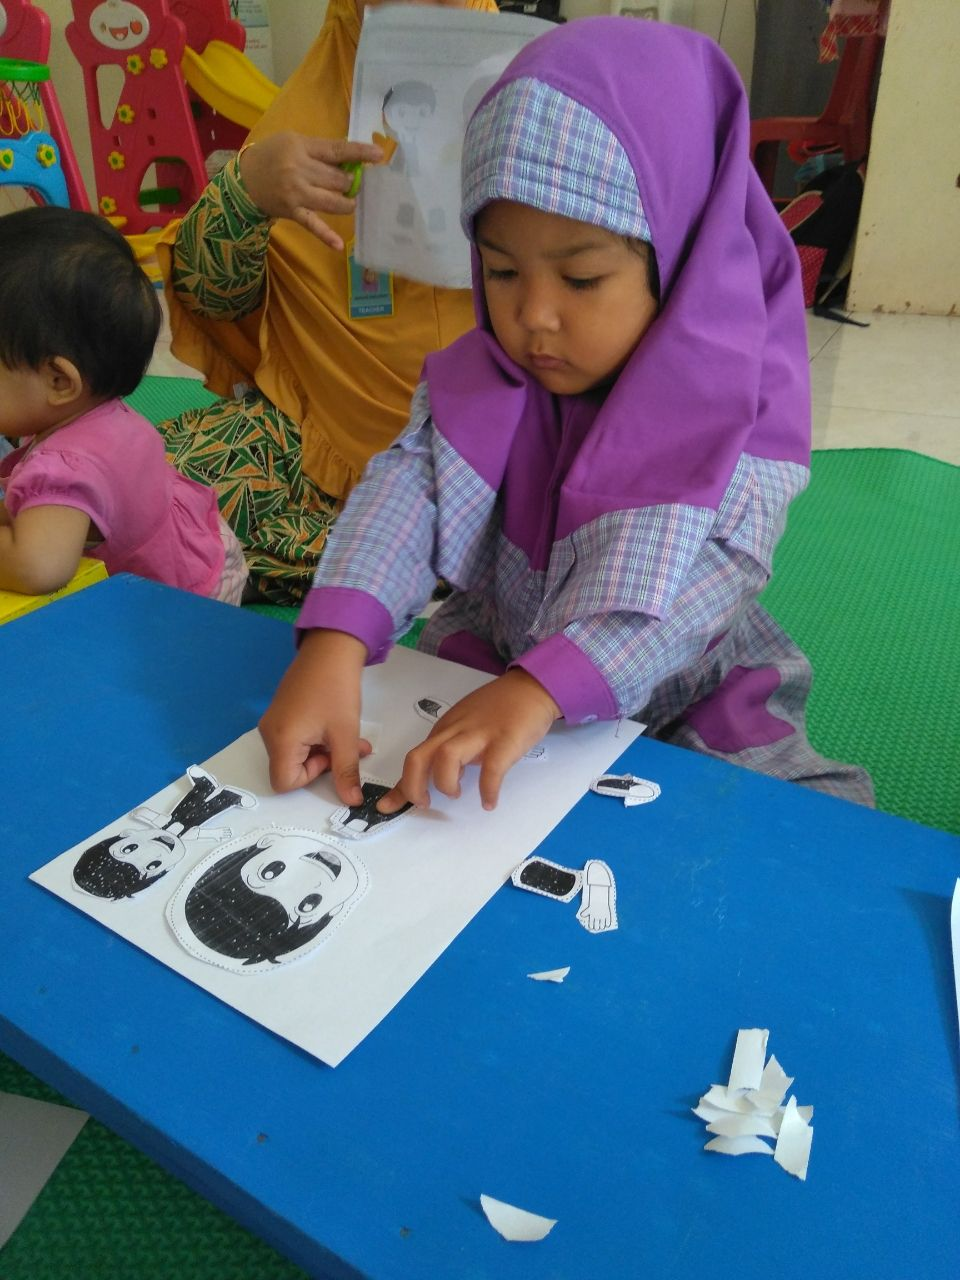 Mengenal Anggota Tubuh Melalui Gambar Pada Anak Usia Dini